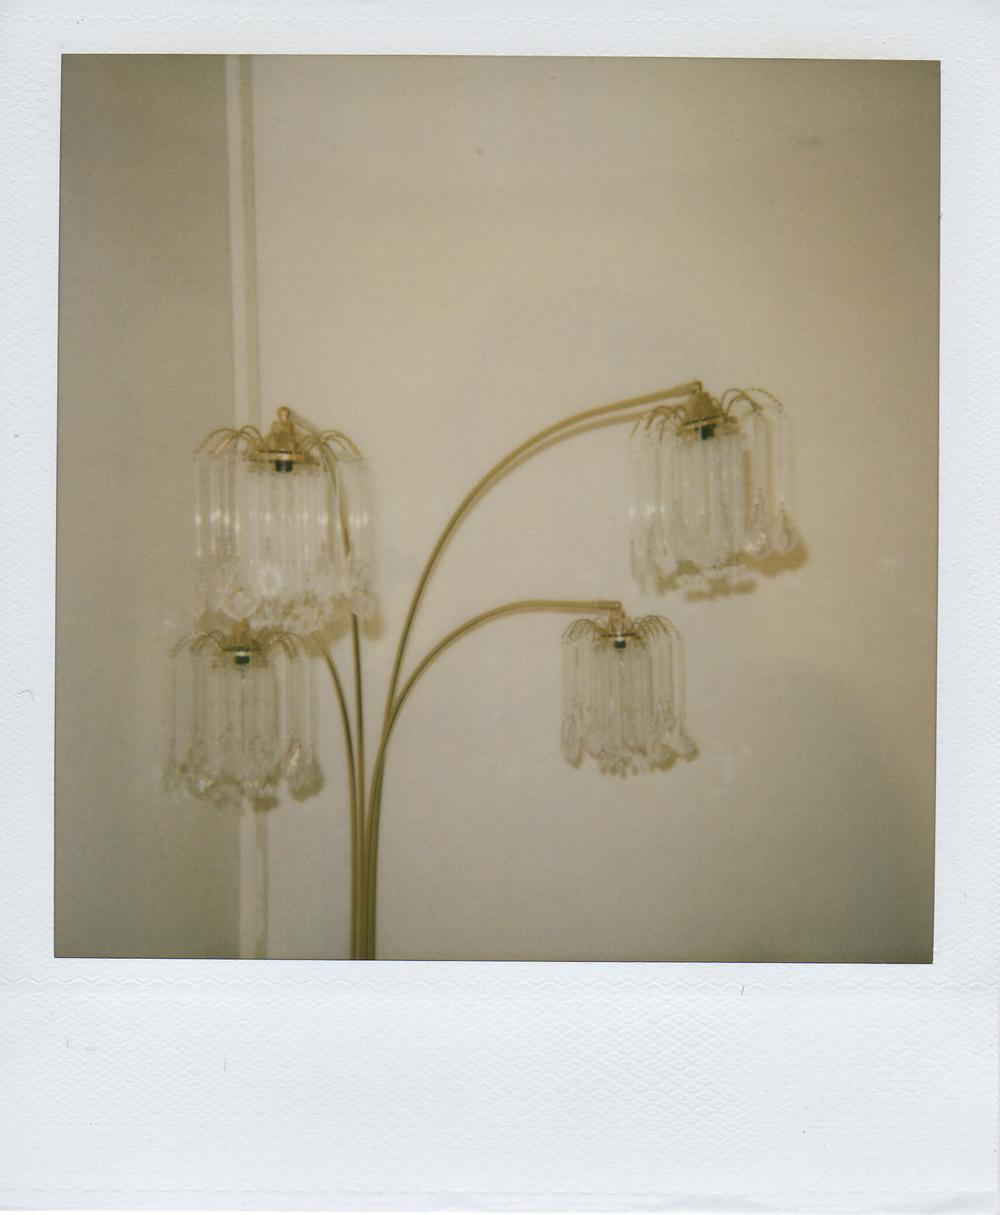 jlaurence-polaroid-030.jpg